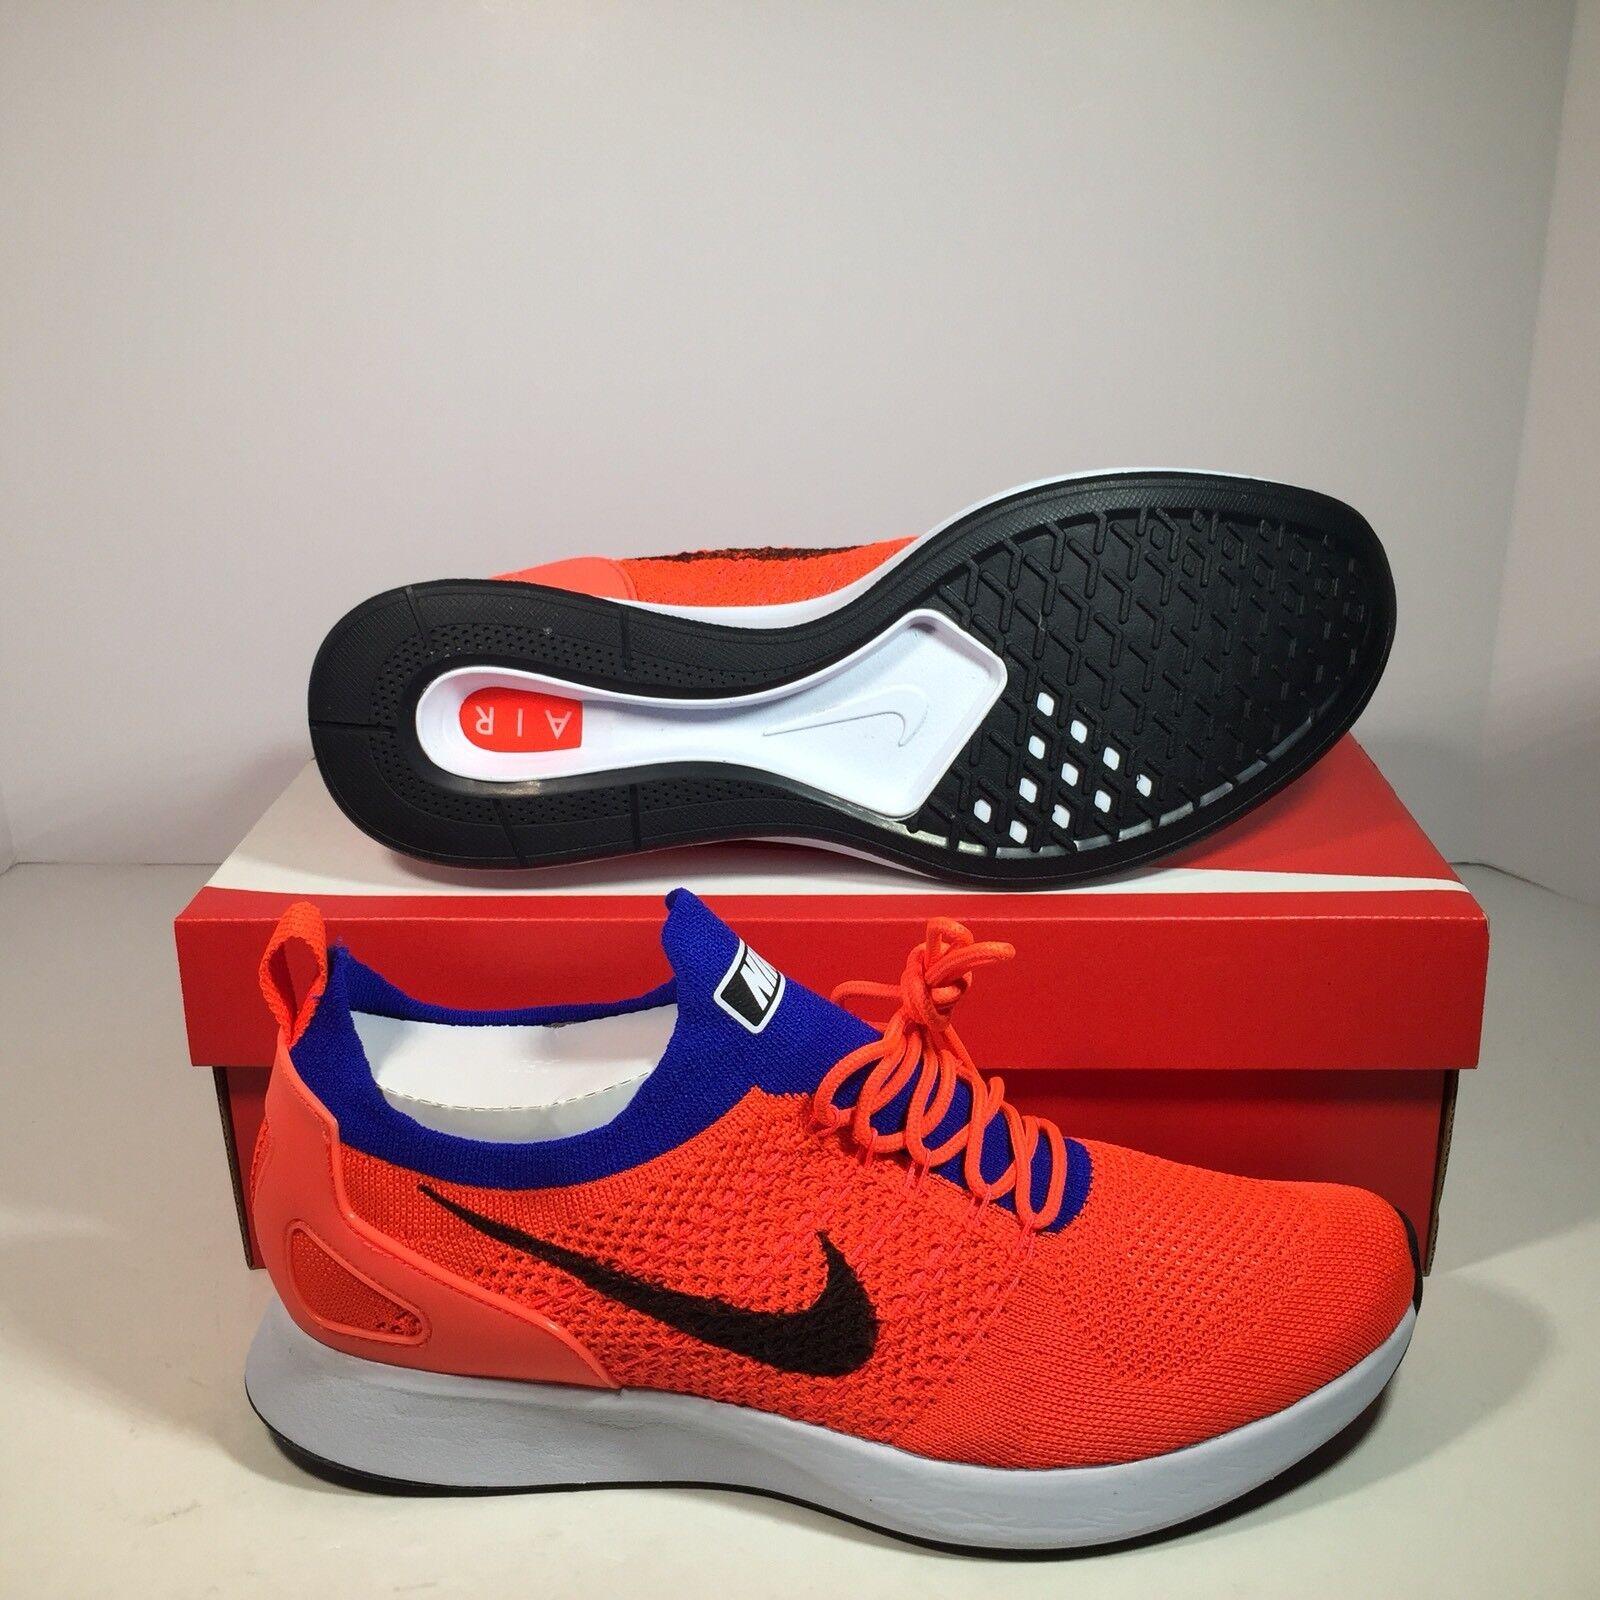 Nike Air Zoom Mariah Flyknit Racer Total Crimson Men's Running shoes 918264-800